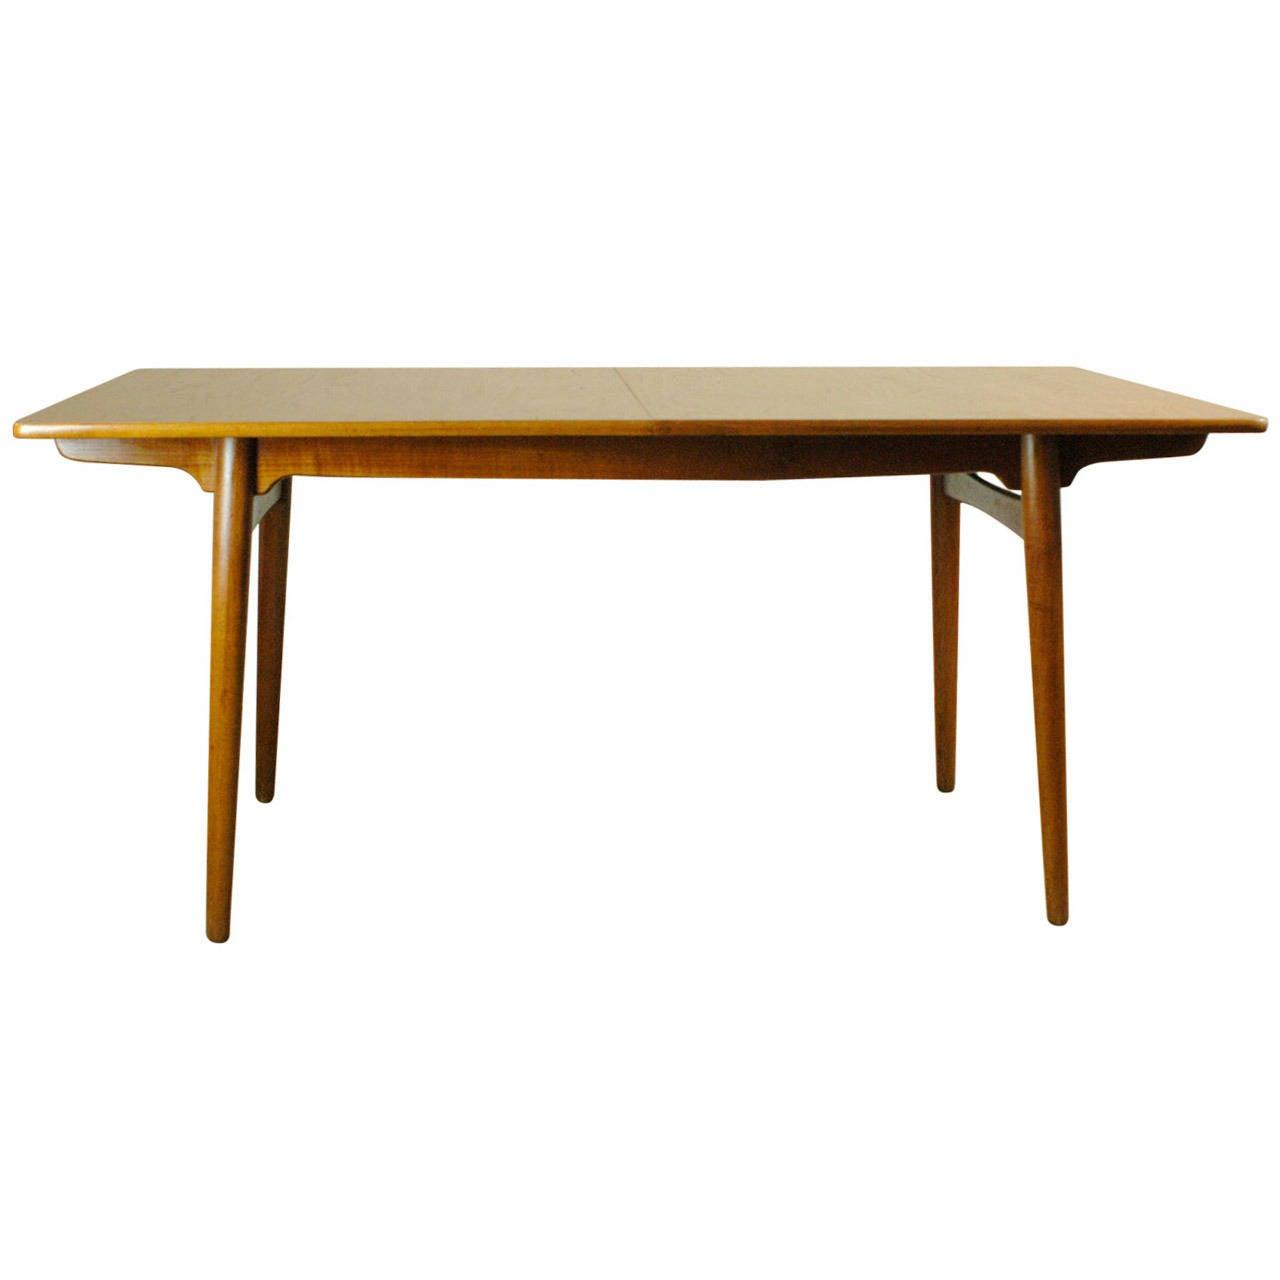 Modern teak dining table mid century modern teak dining for G plan teak dining room furniture